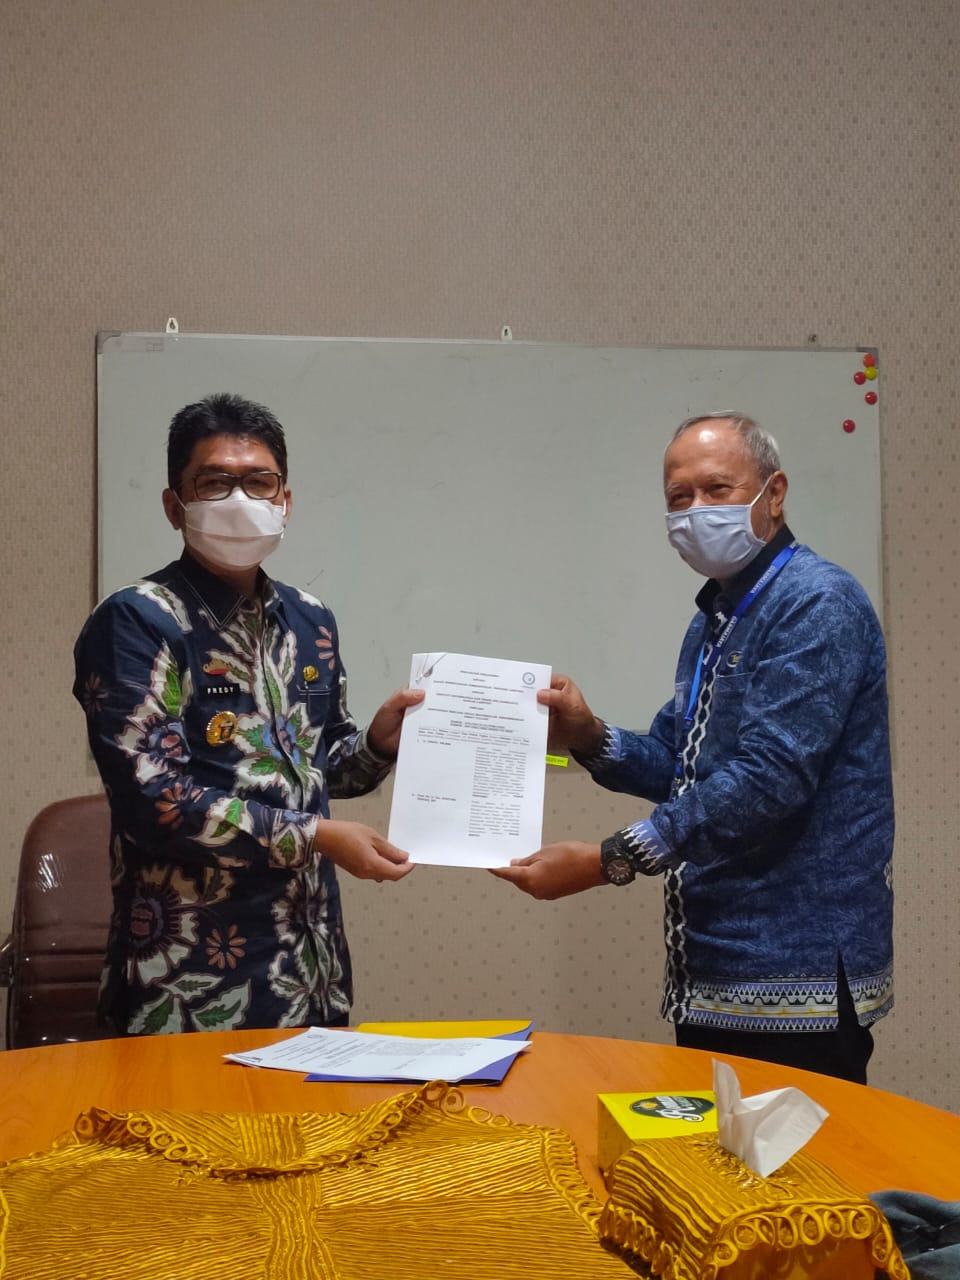 IIB Darmajaya–Bappeda Lampung Kerjasama Penyusunan Masterplan Smart Village